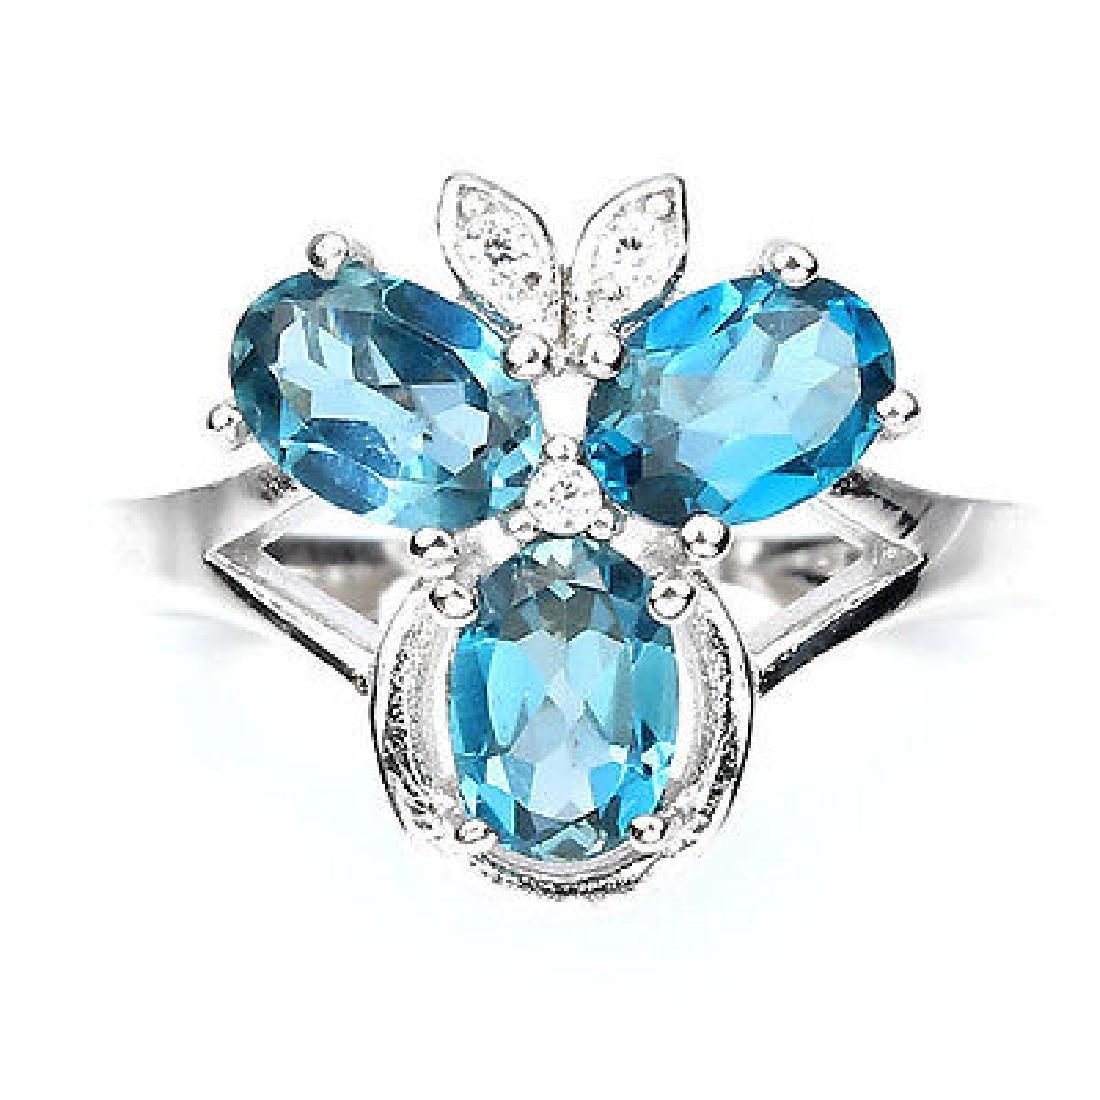 Natural London Blue Topaz Ring